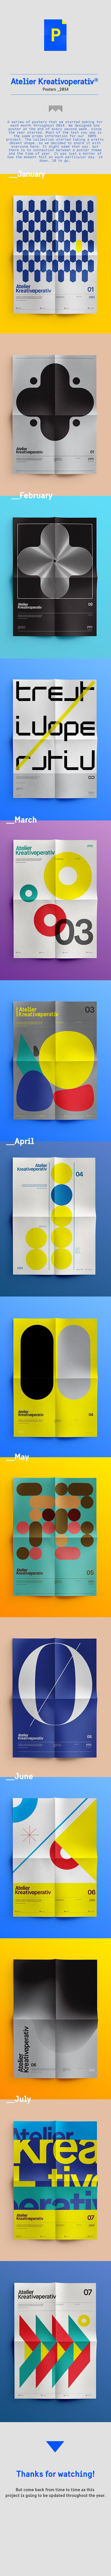 Kreativoperativ® / A Year in Posters. by Marko Vuleta-Djukanov, via Behance